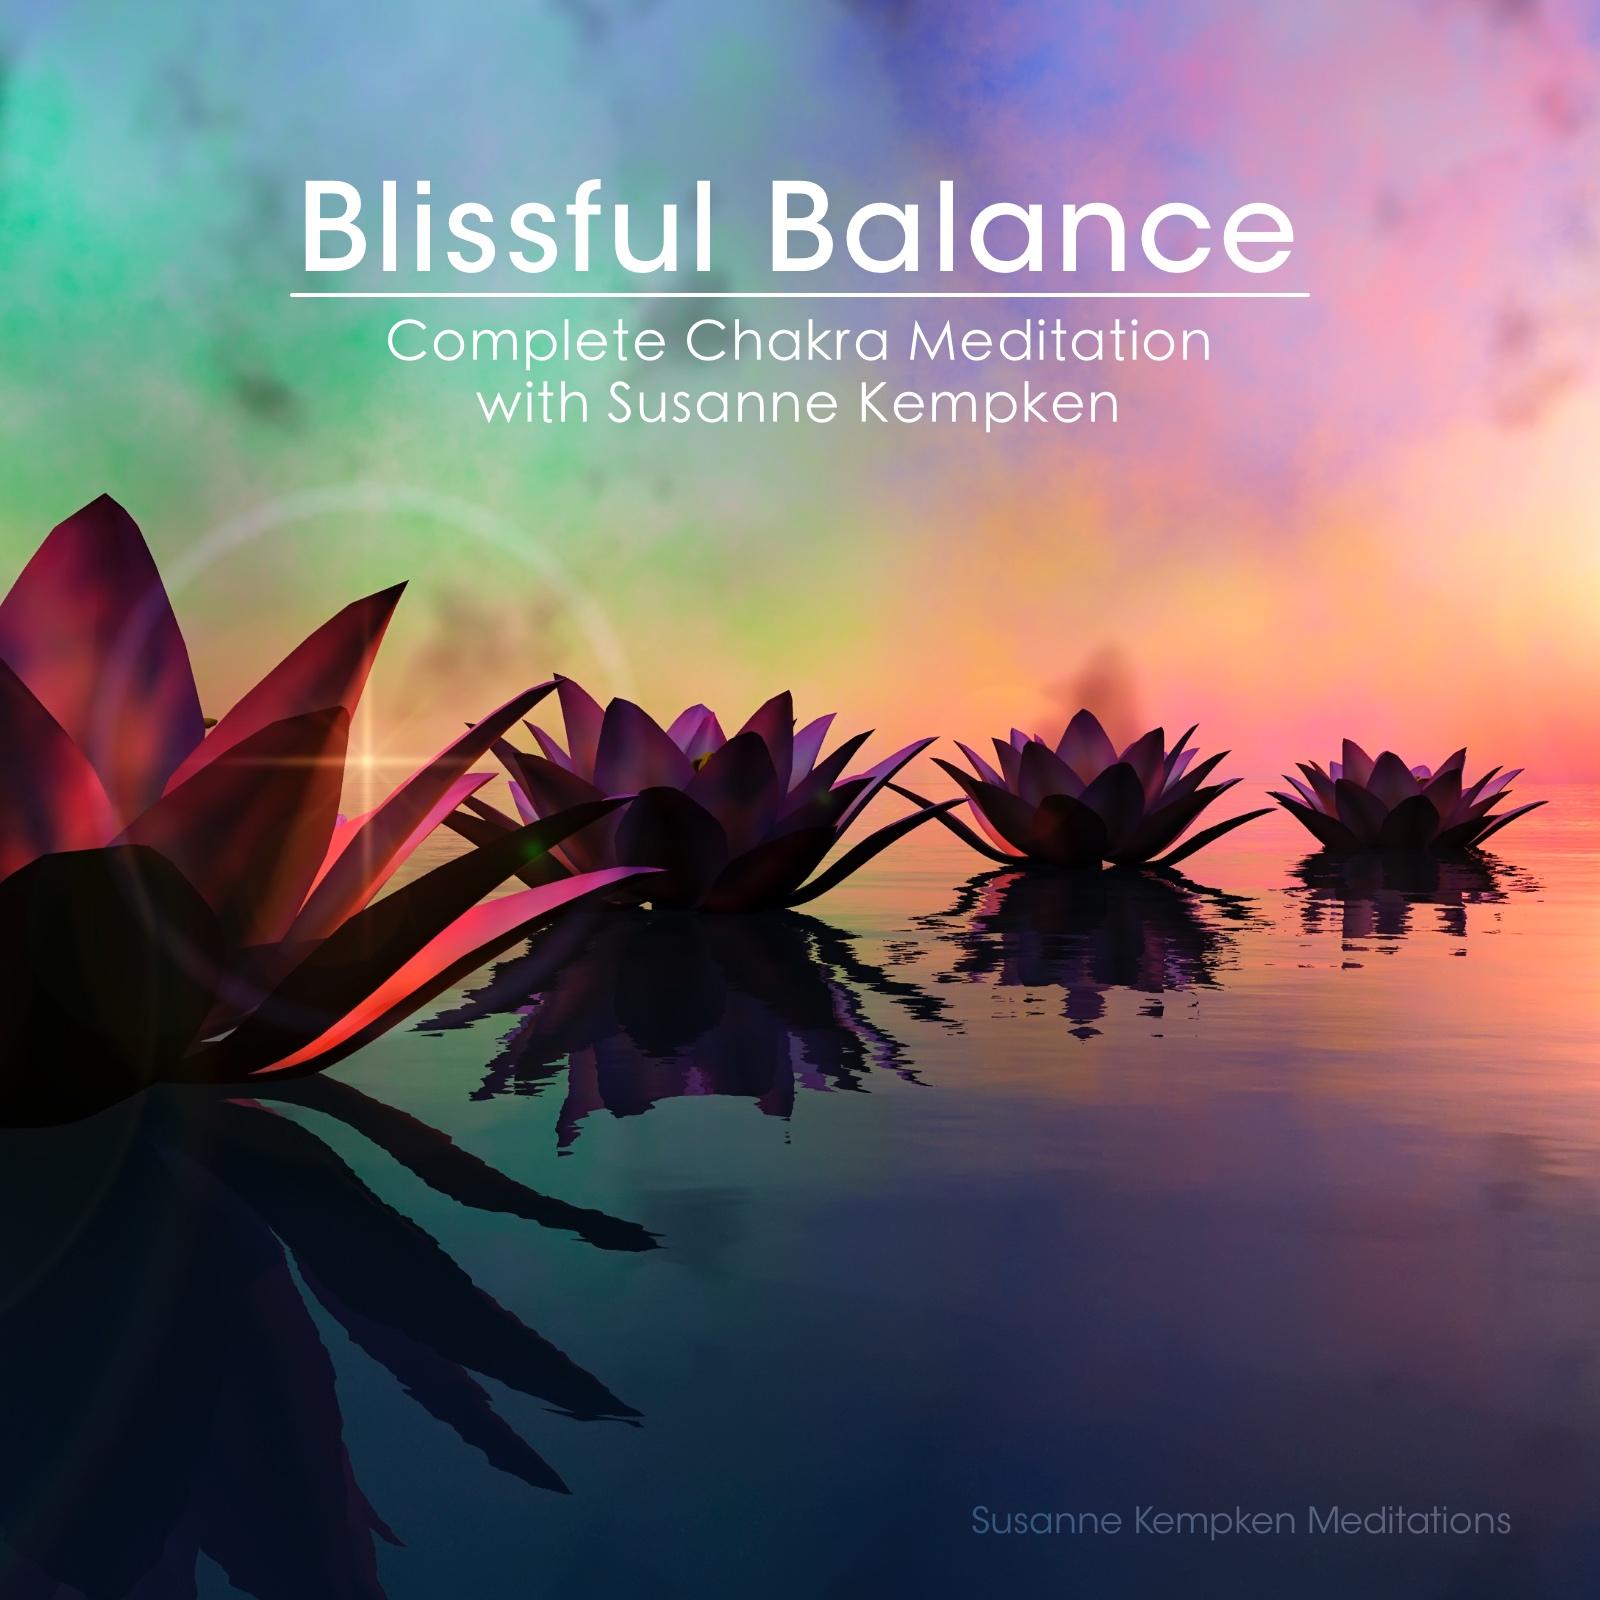 Blissful Balance - Complete Chakra Meditation by Susanne Kempken